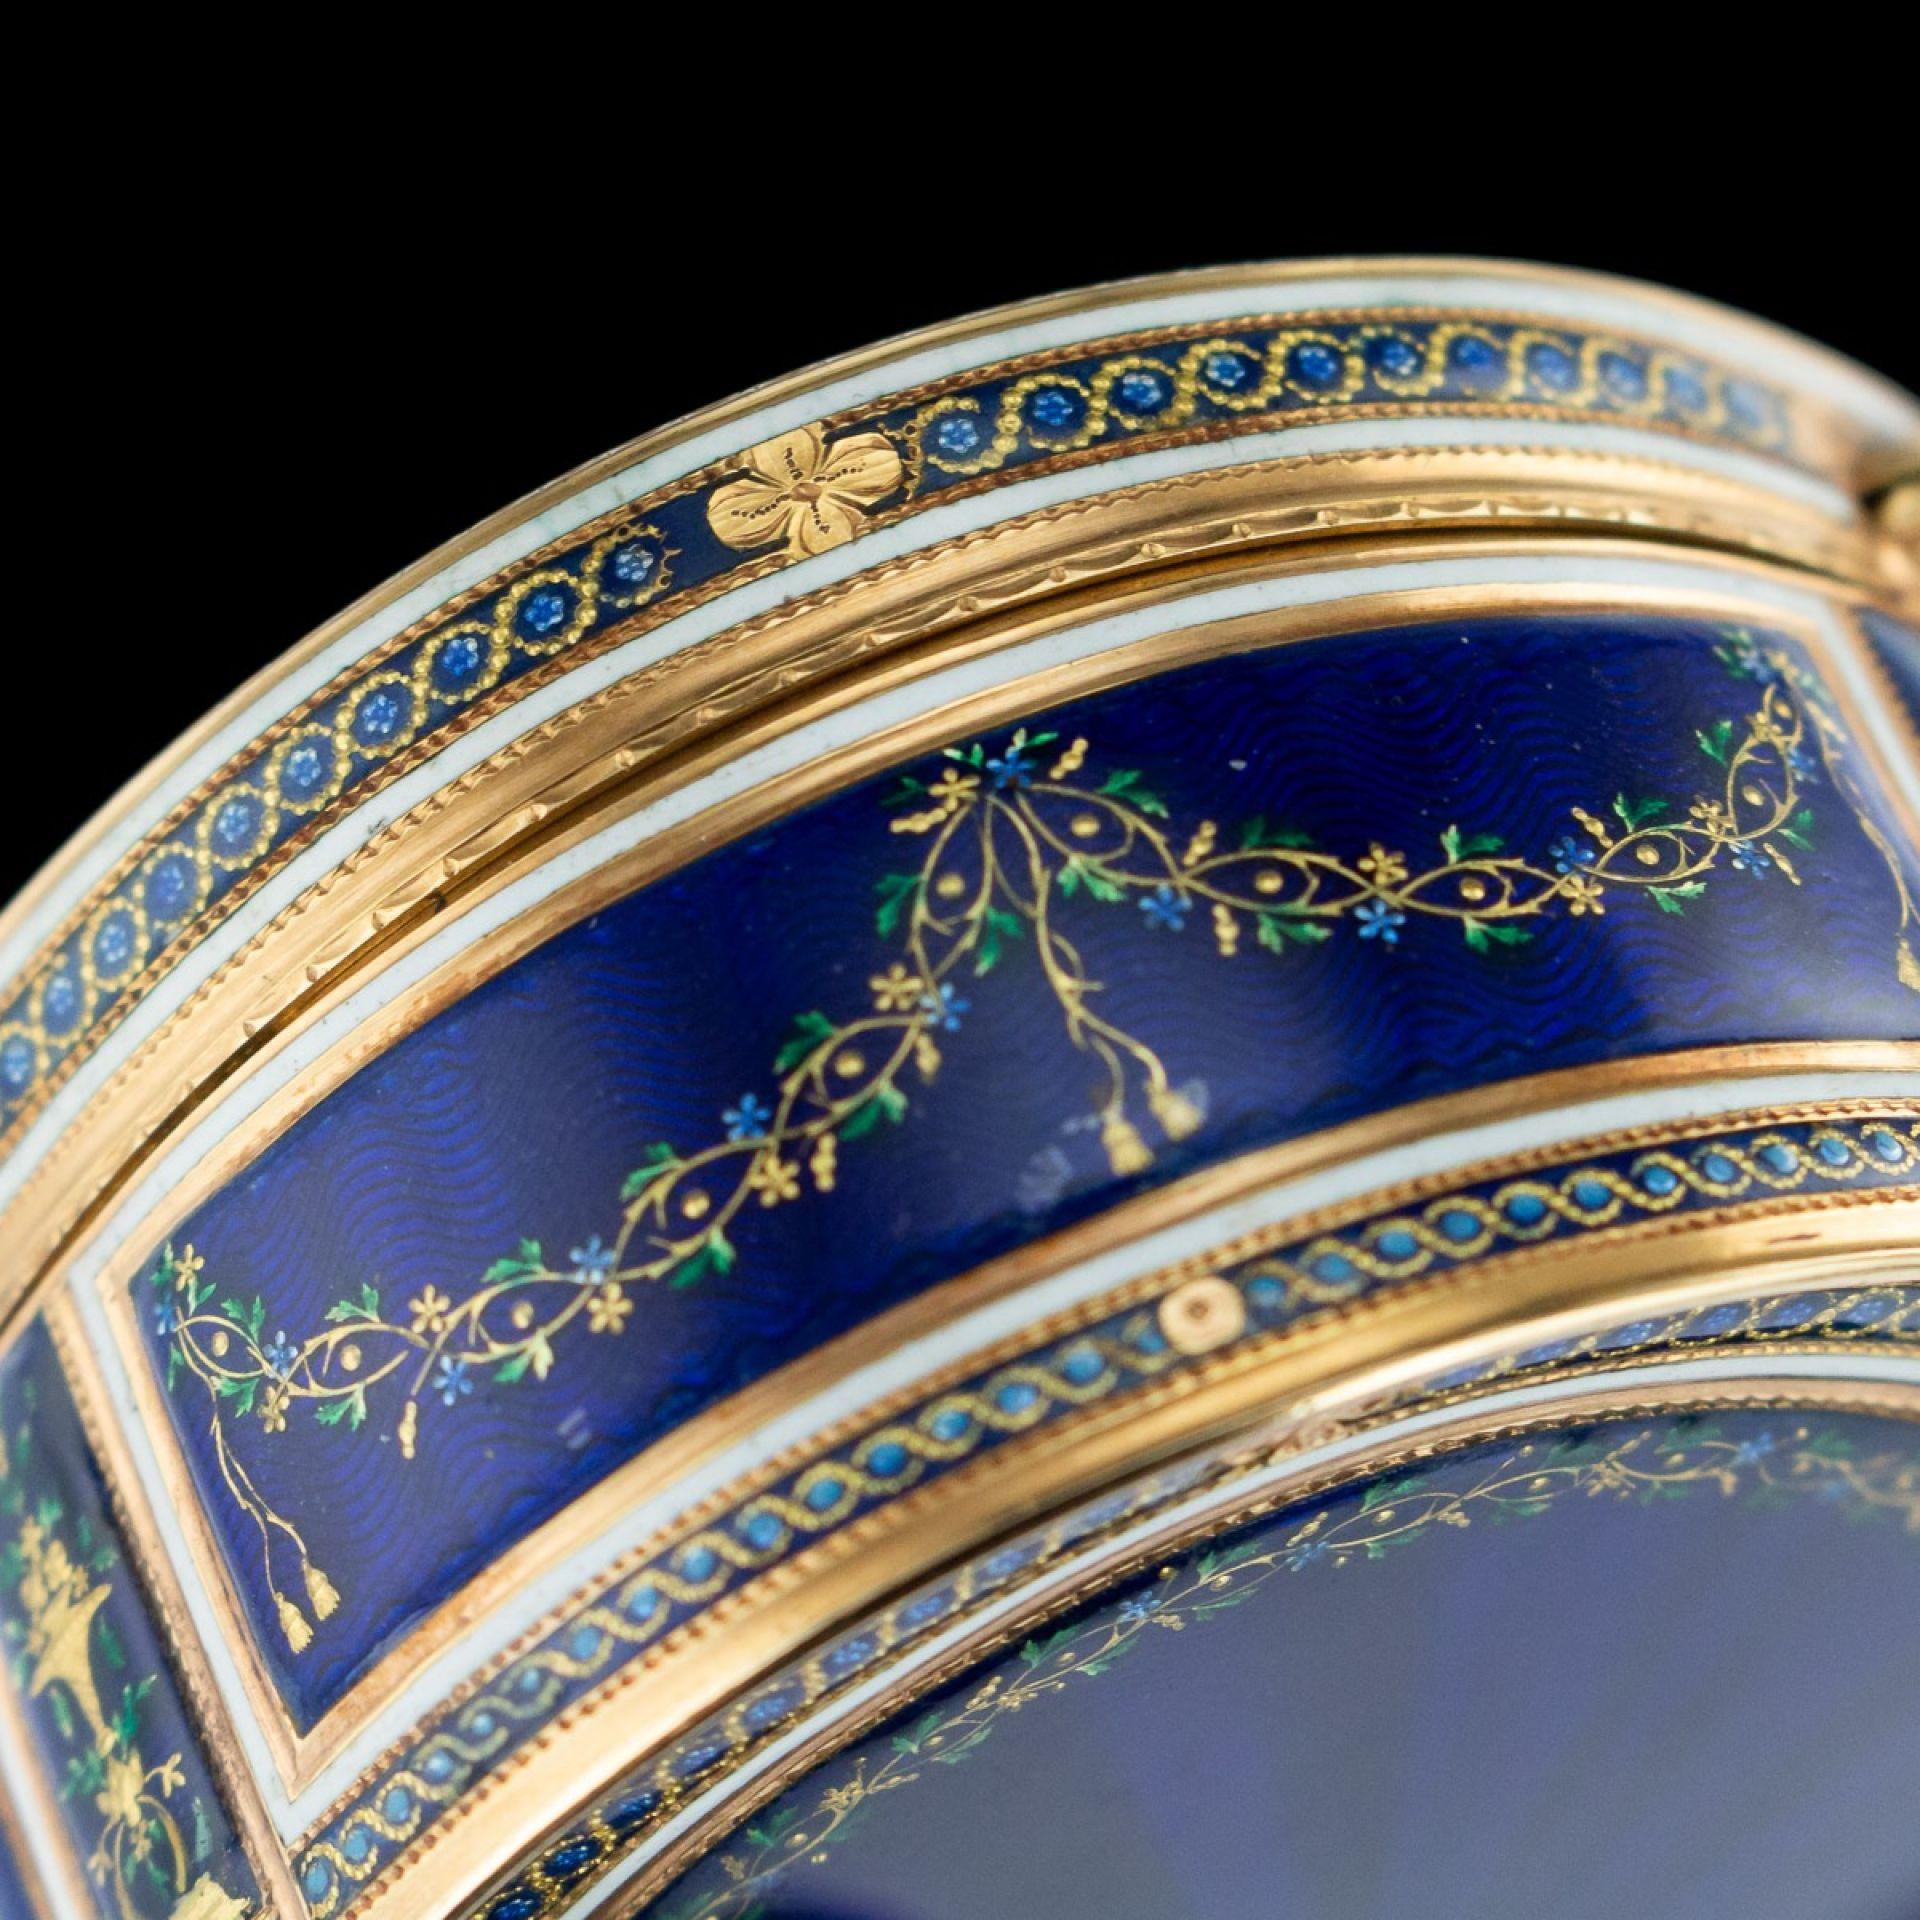 ANTIQUE 18thC FRENCH 18k GOLD & ENAMEL SNUFF BOX, PARIS c.1784